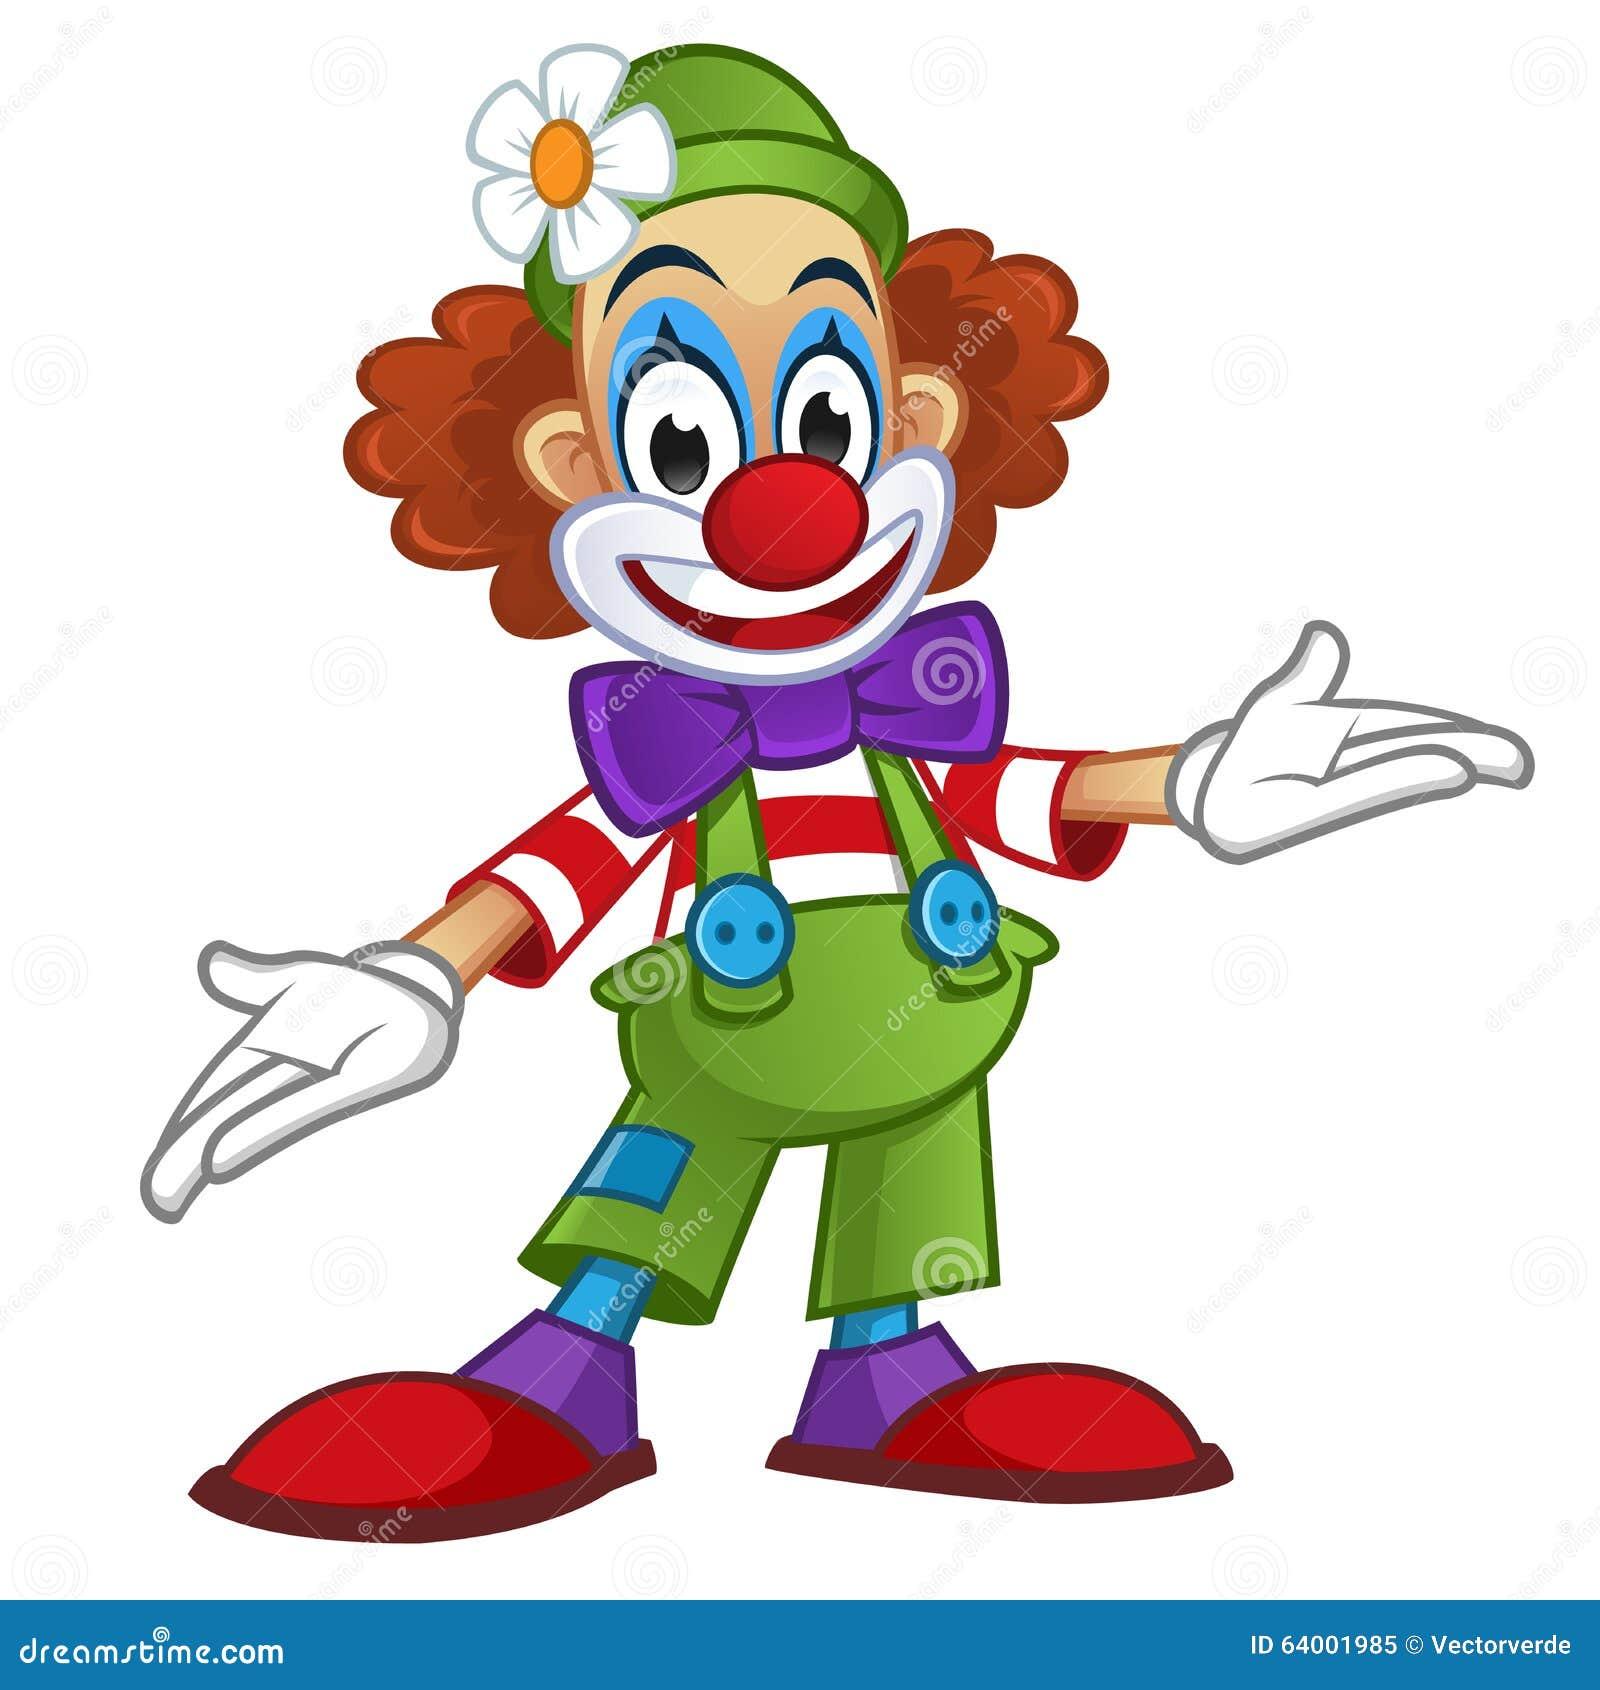 Klaun ilustracja wektor obraz z o onej z bia y smiling for Immagini pagliaccio per bambini